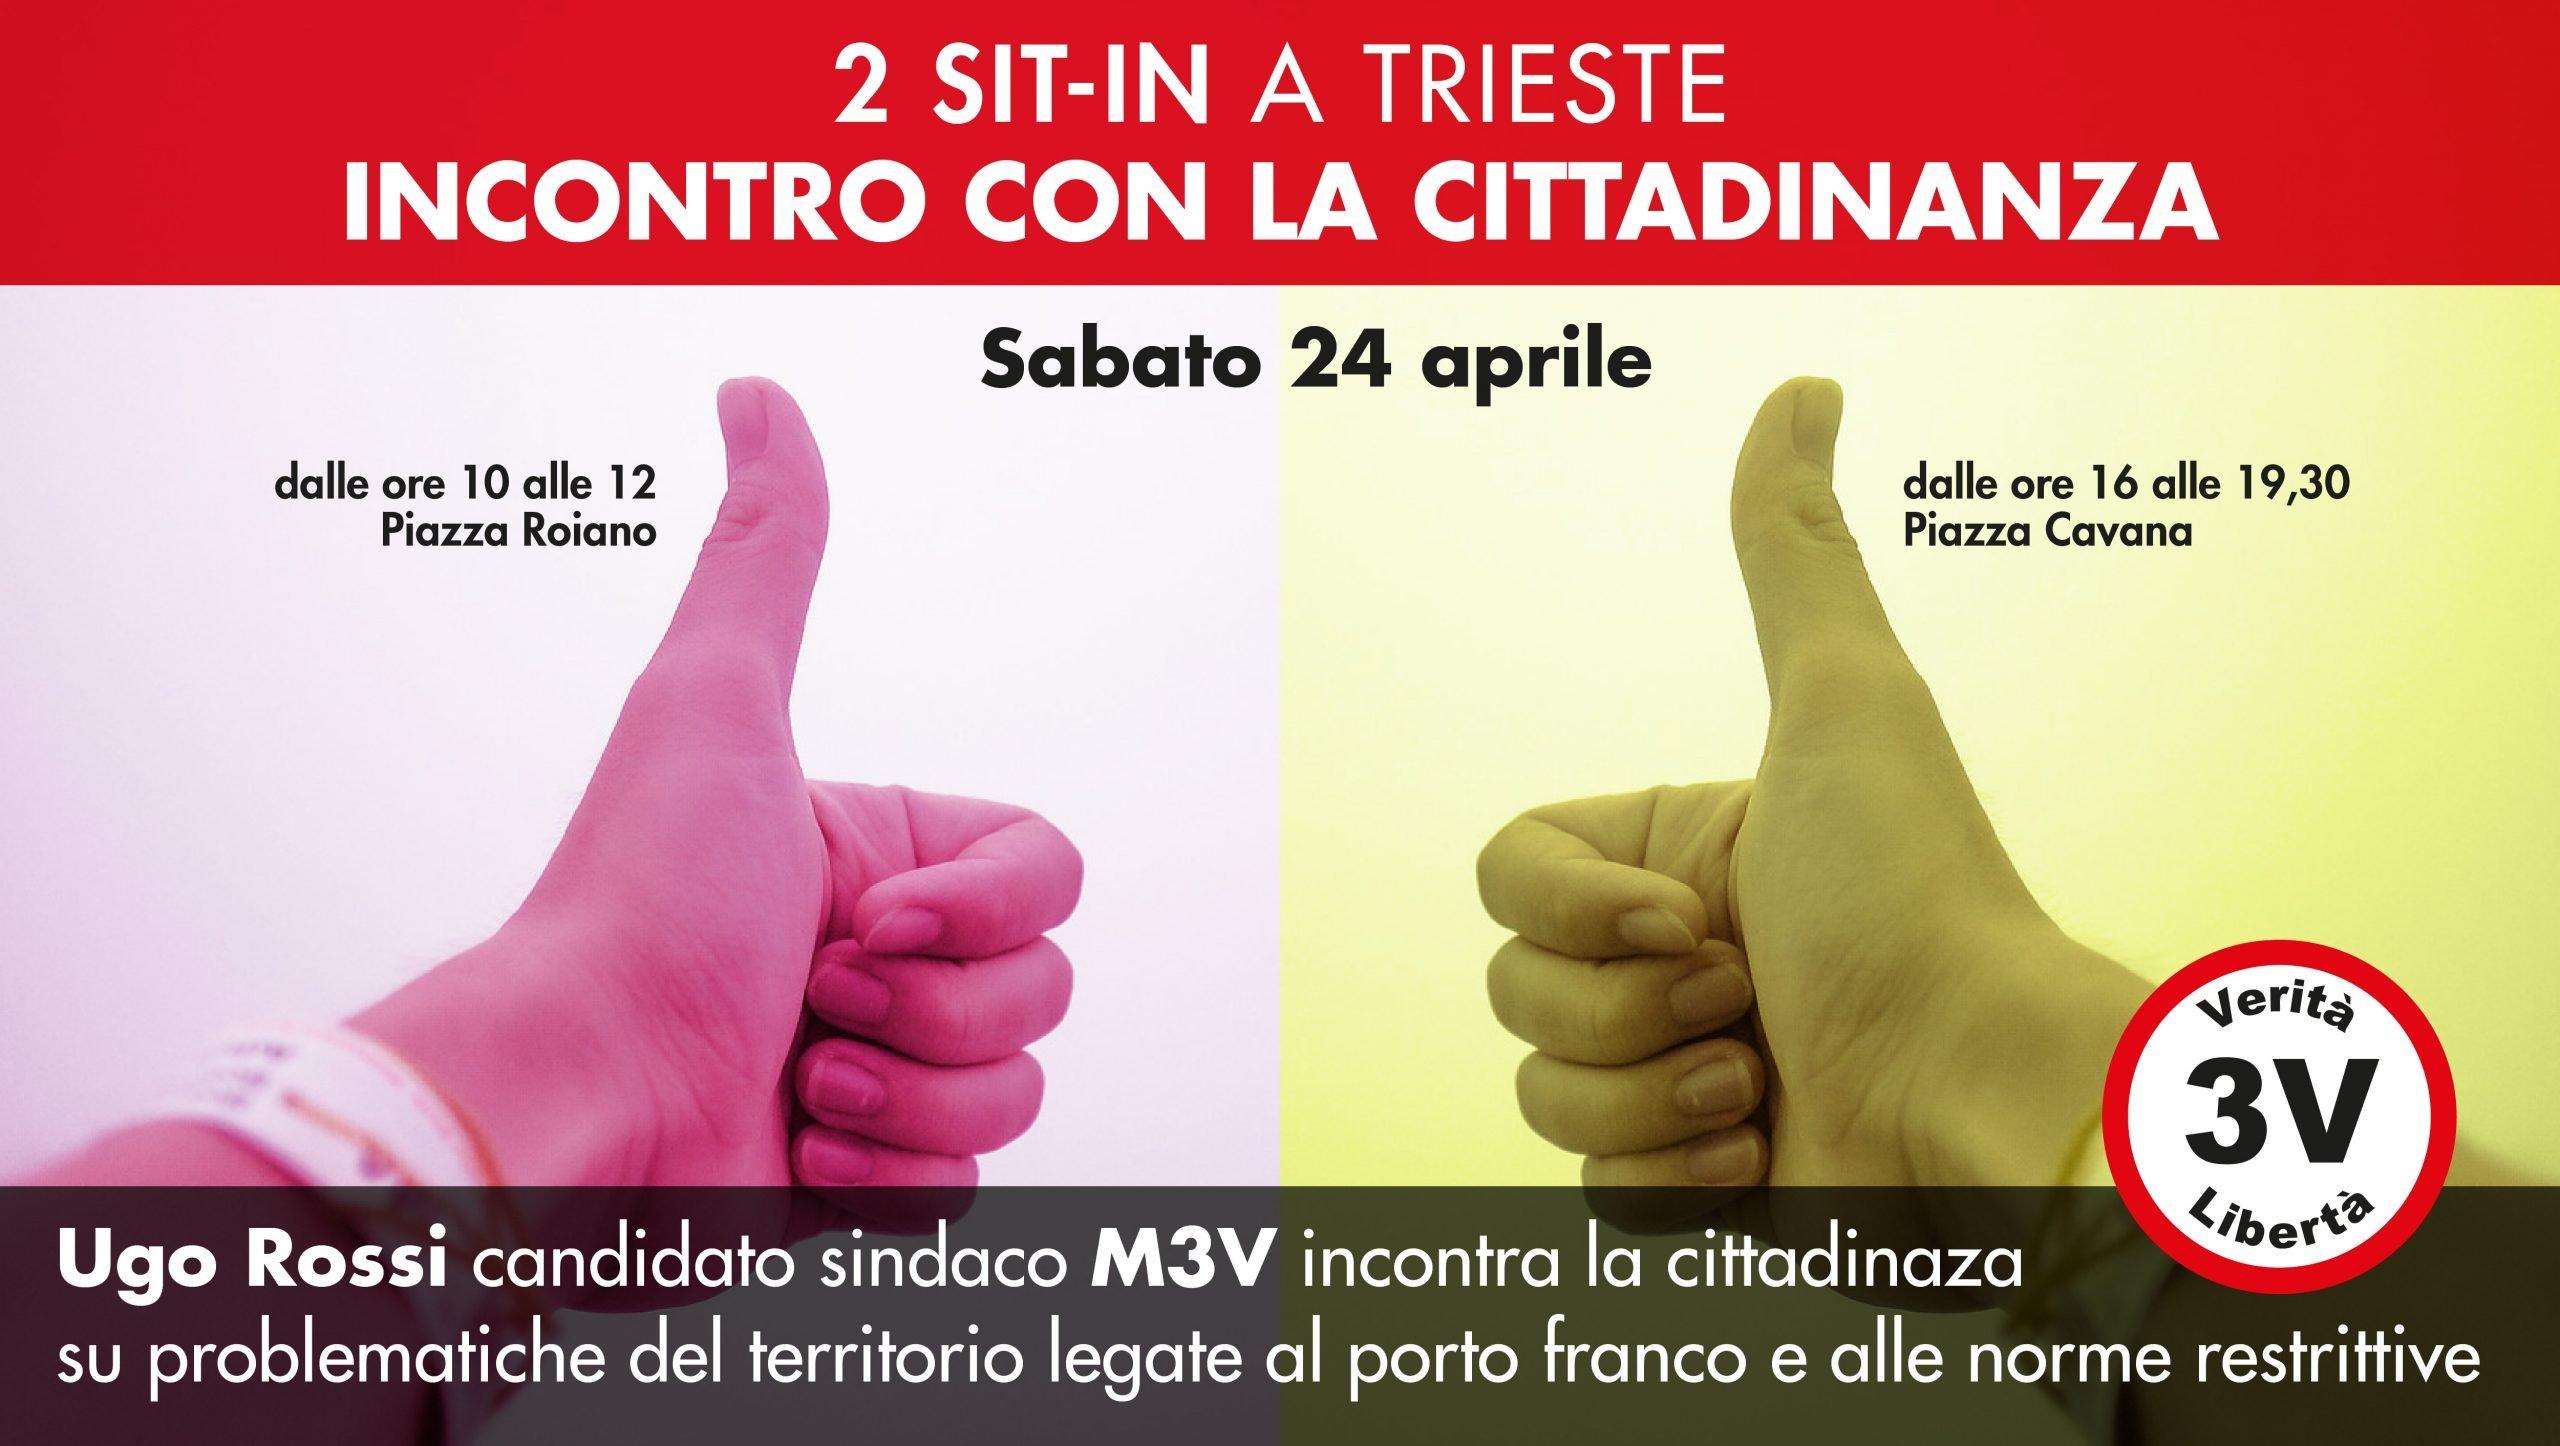 Due Sit-in a Trieste con il candidato sindaco Ugo Rossi